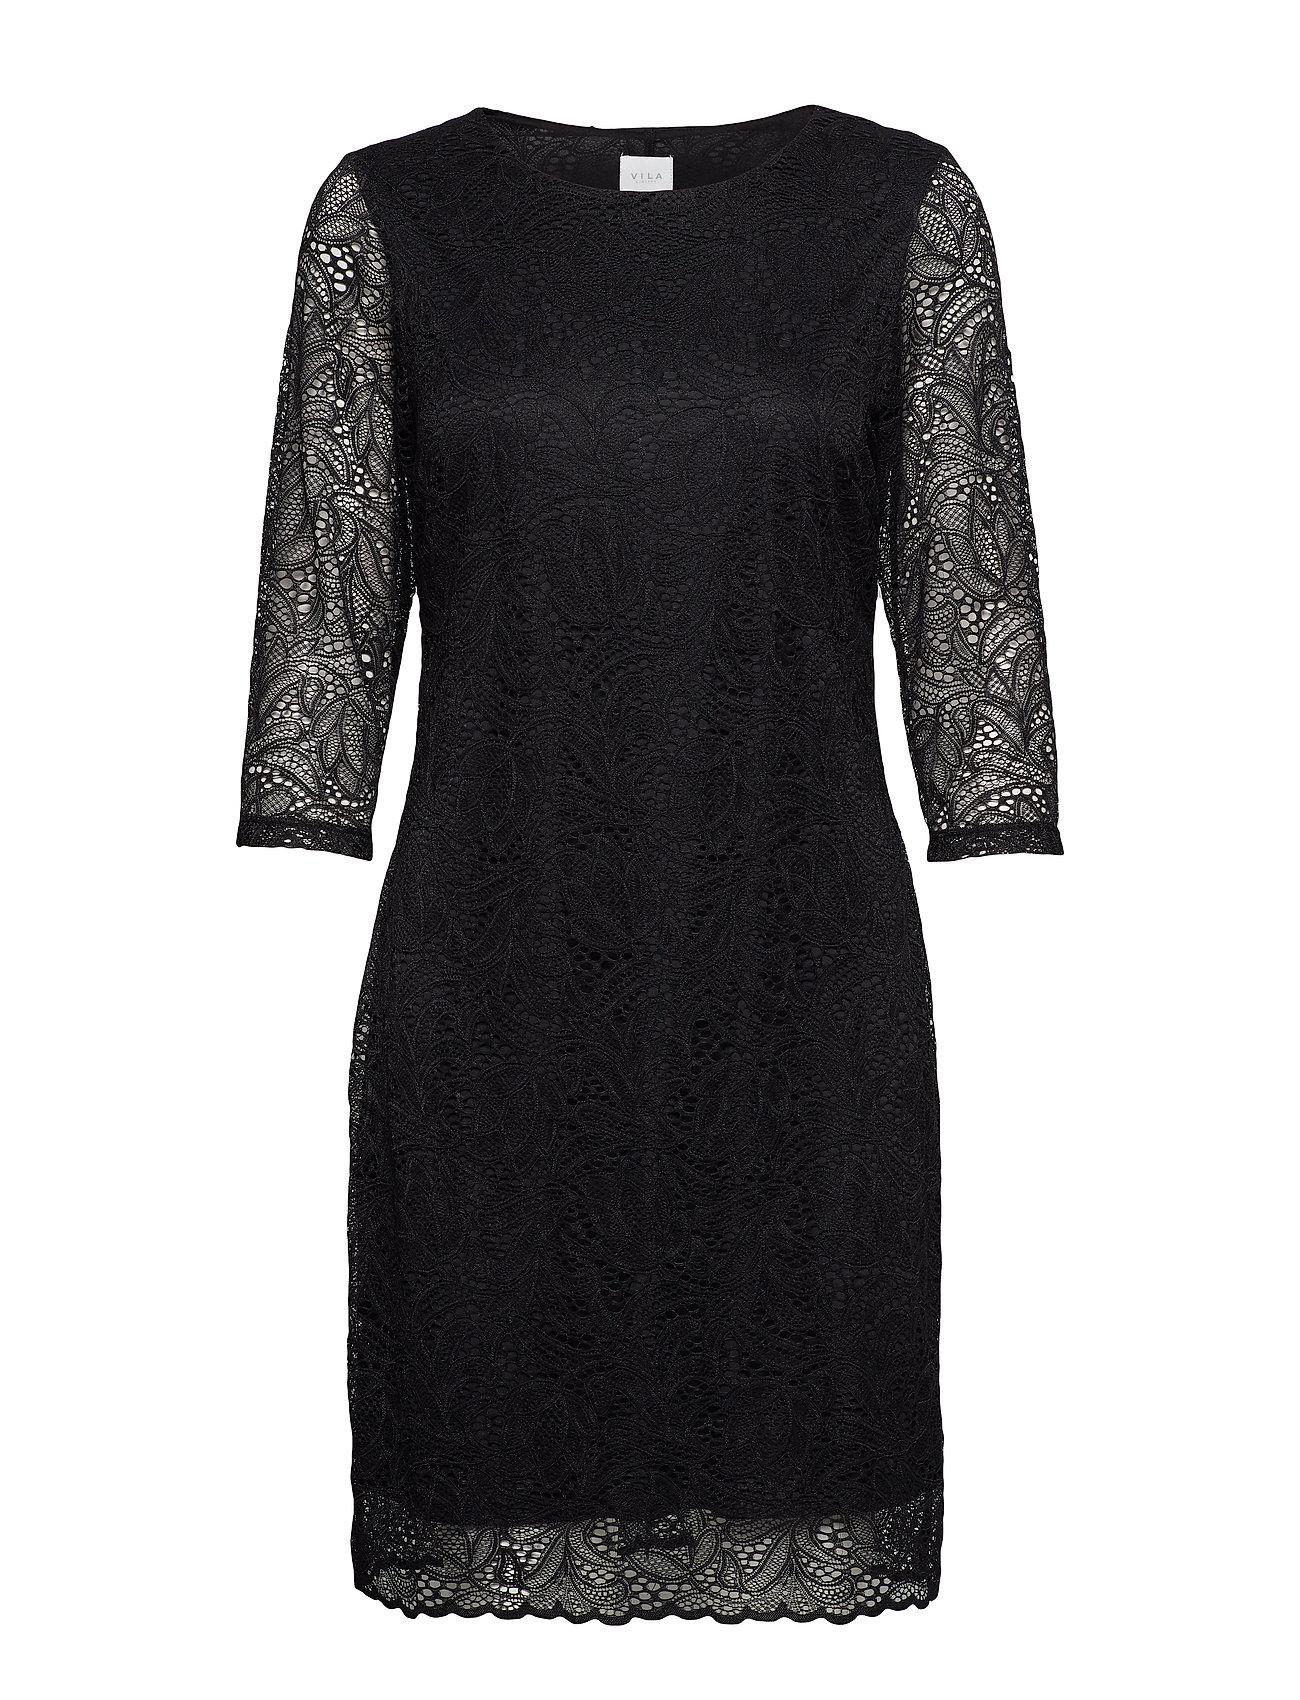 Vila VIBLOND 3/4 SLEEVE DRESS - NOOS - BLACK